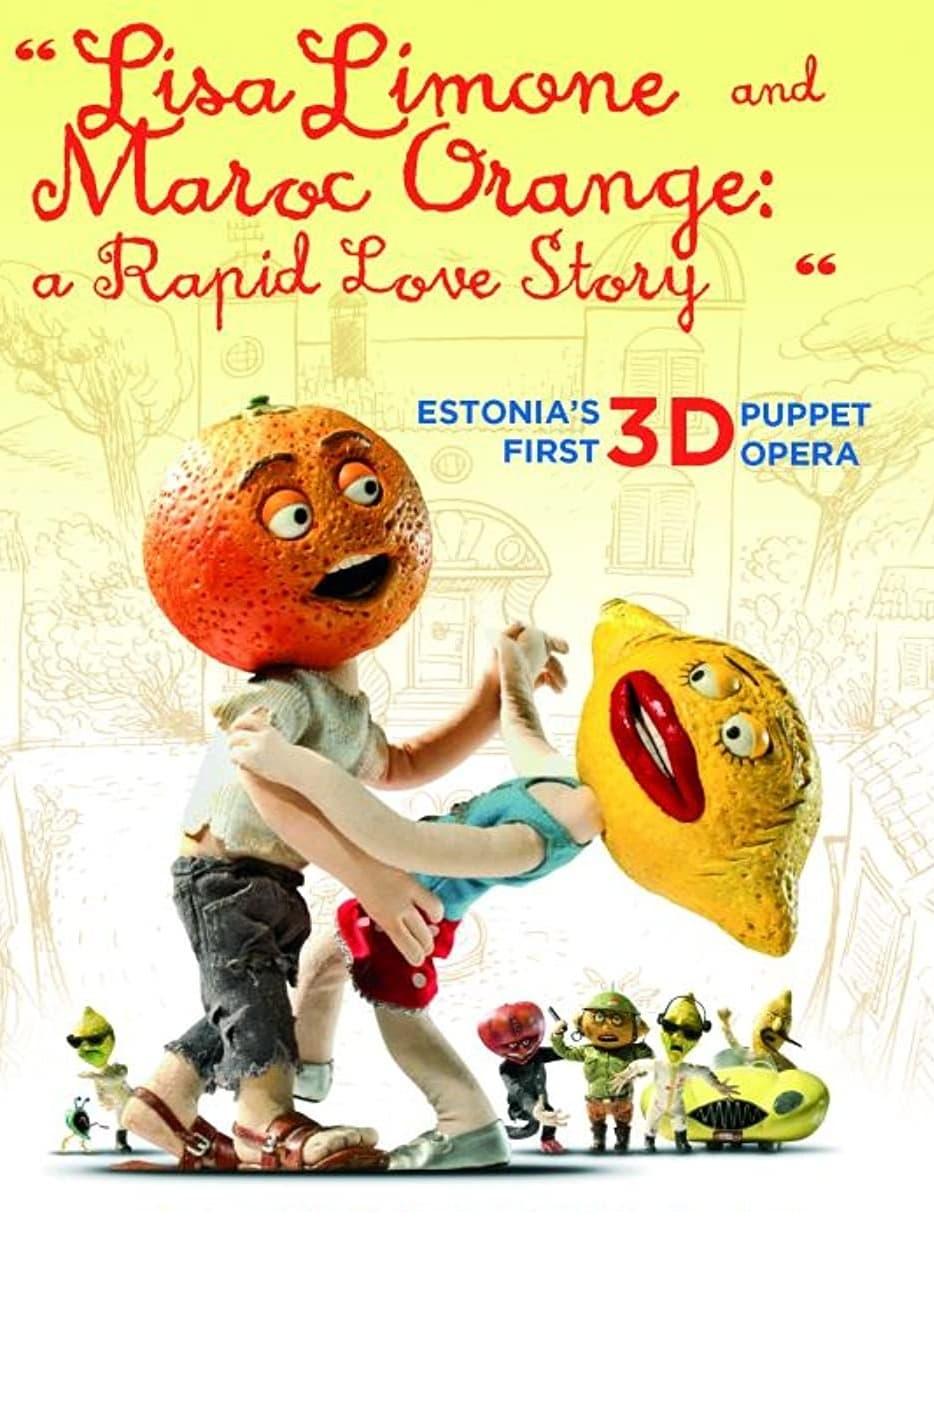 Lisa Limone and Maroc Orange, a Rapid Love Story